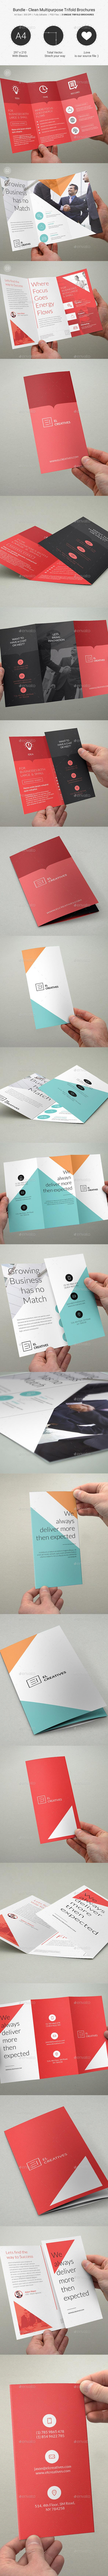 Bundle - Clean Creative Trifold Brochures - 22 - Corporate Brochures